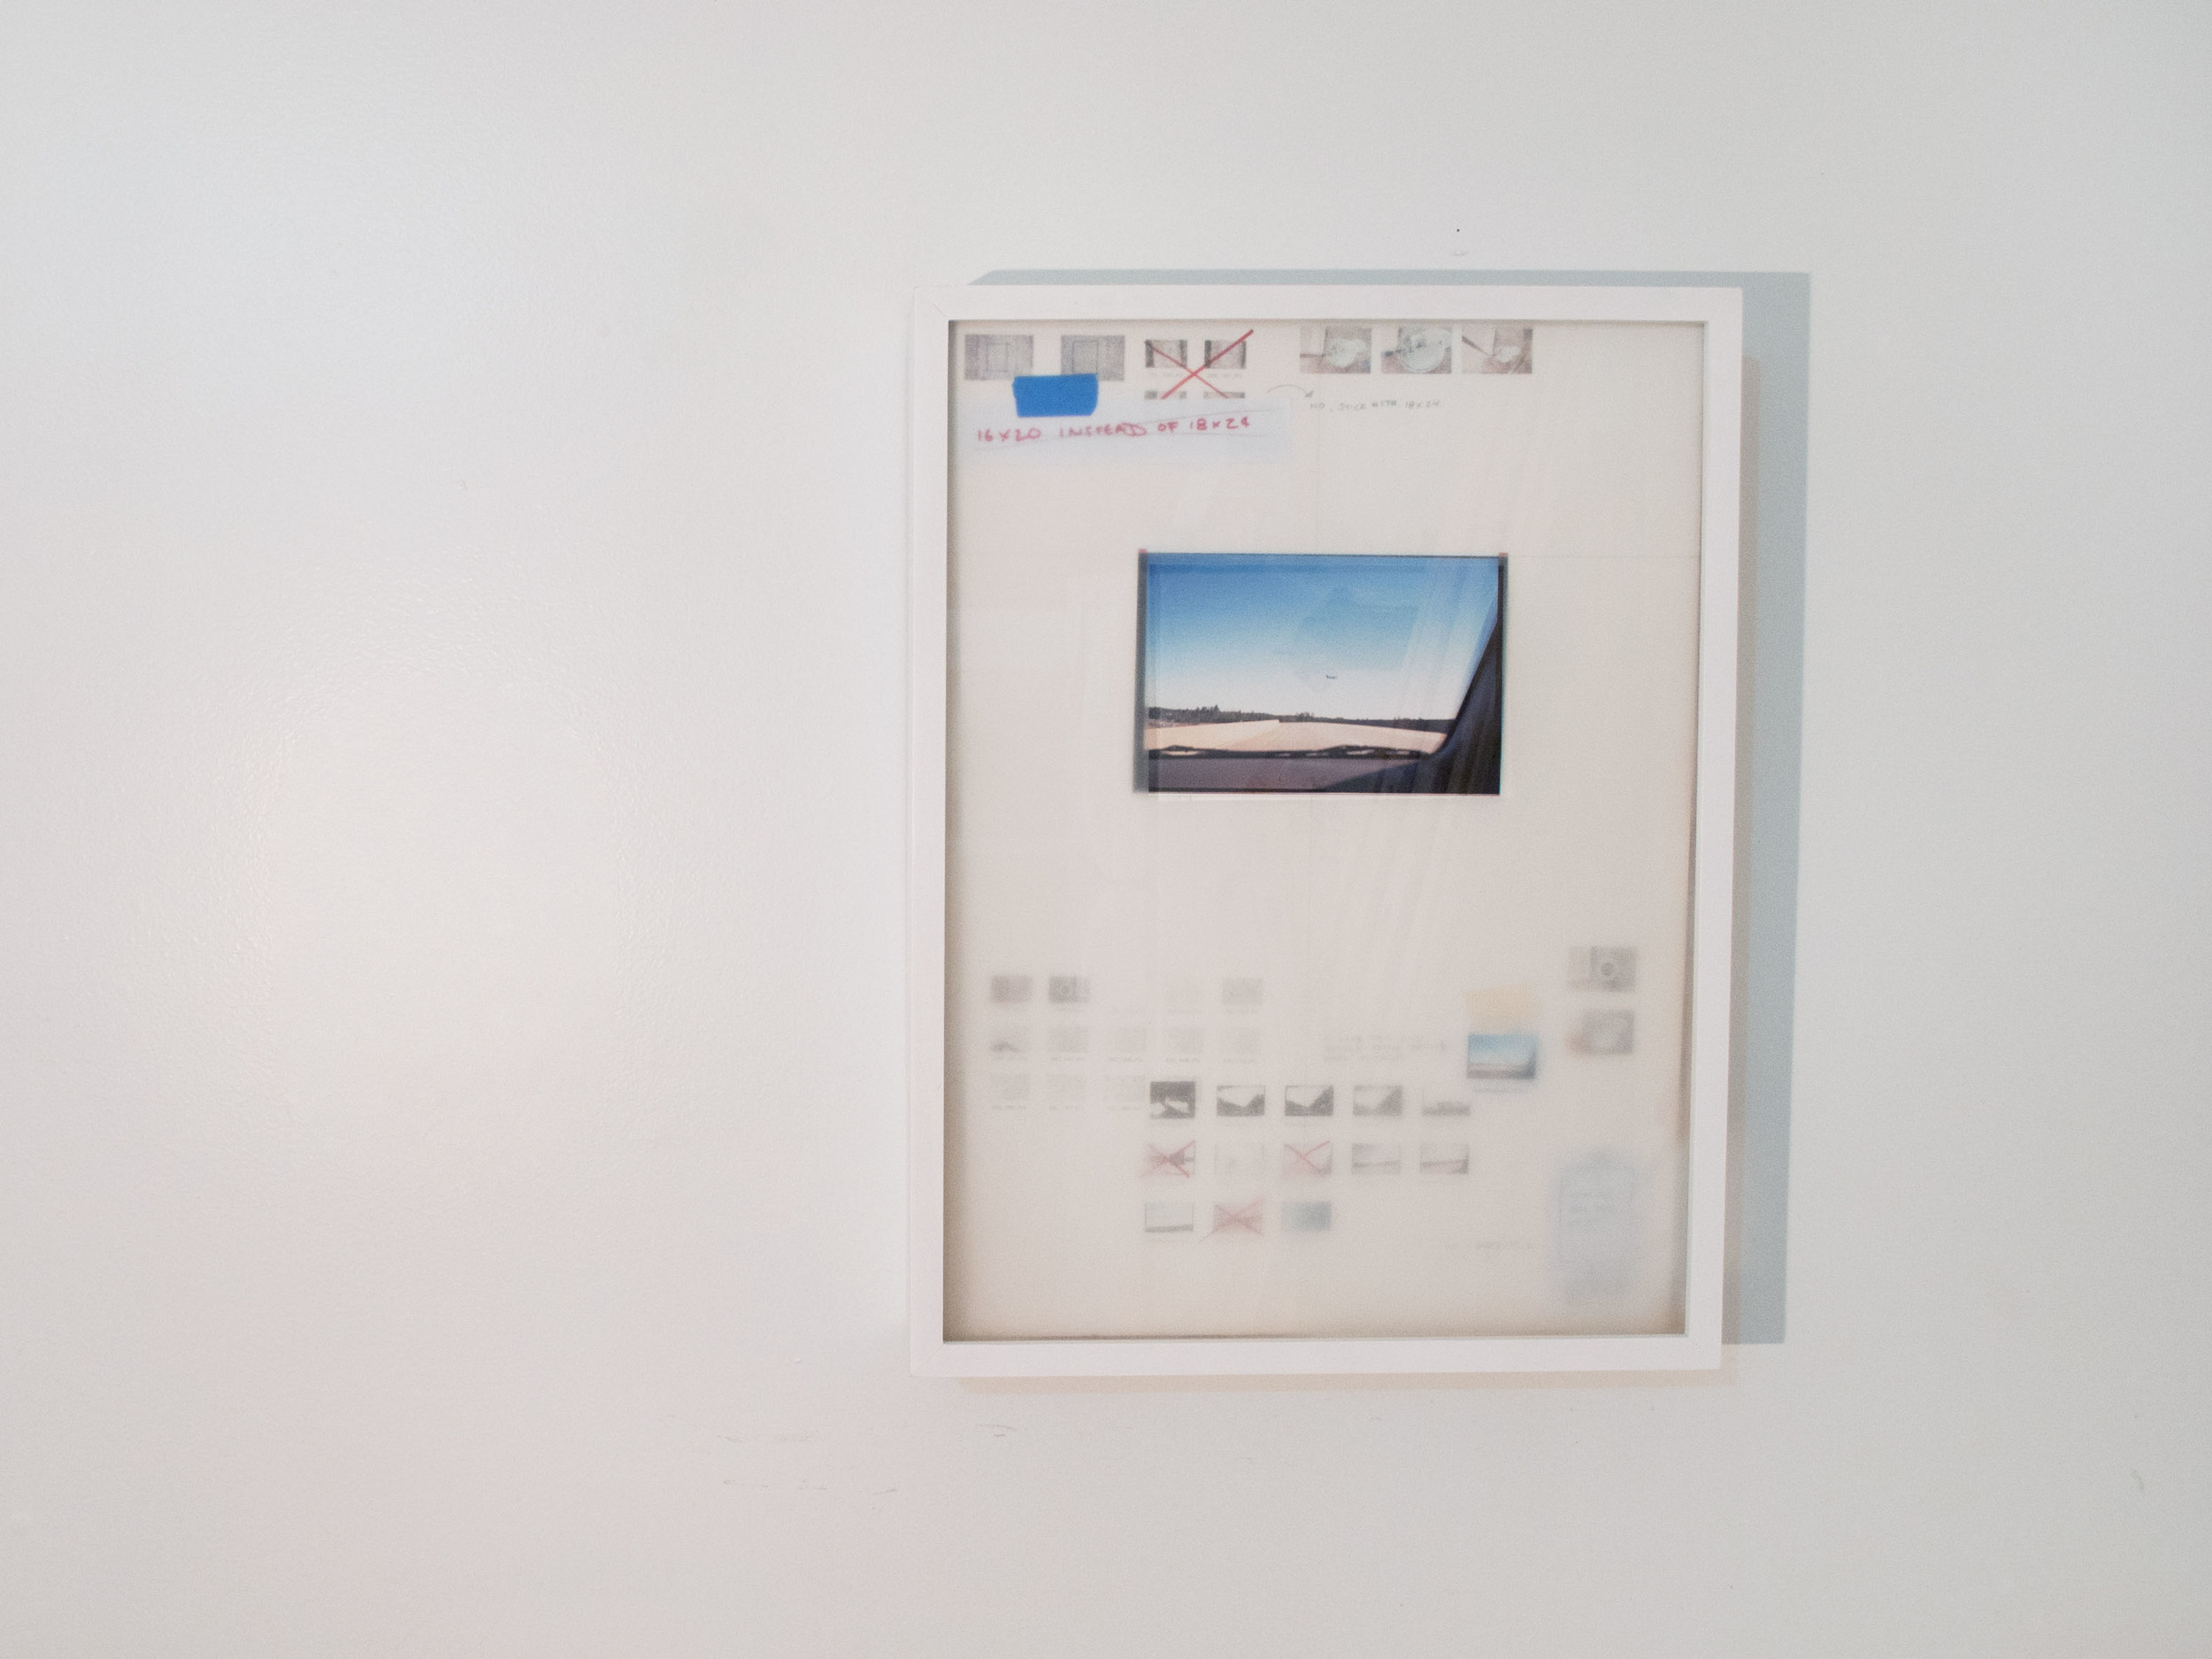 TP_frame8_0002_km9.jpg